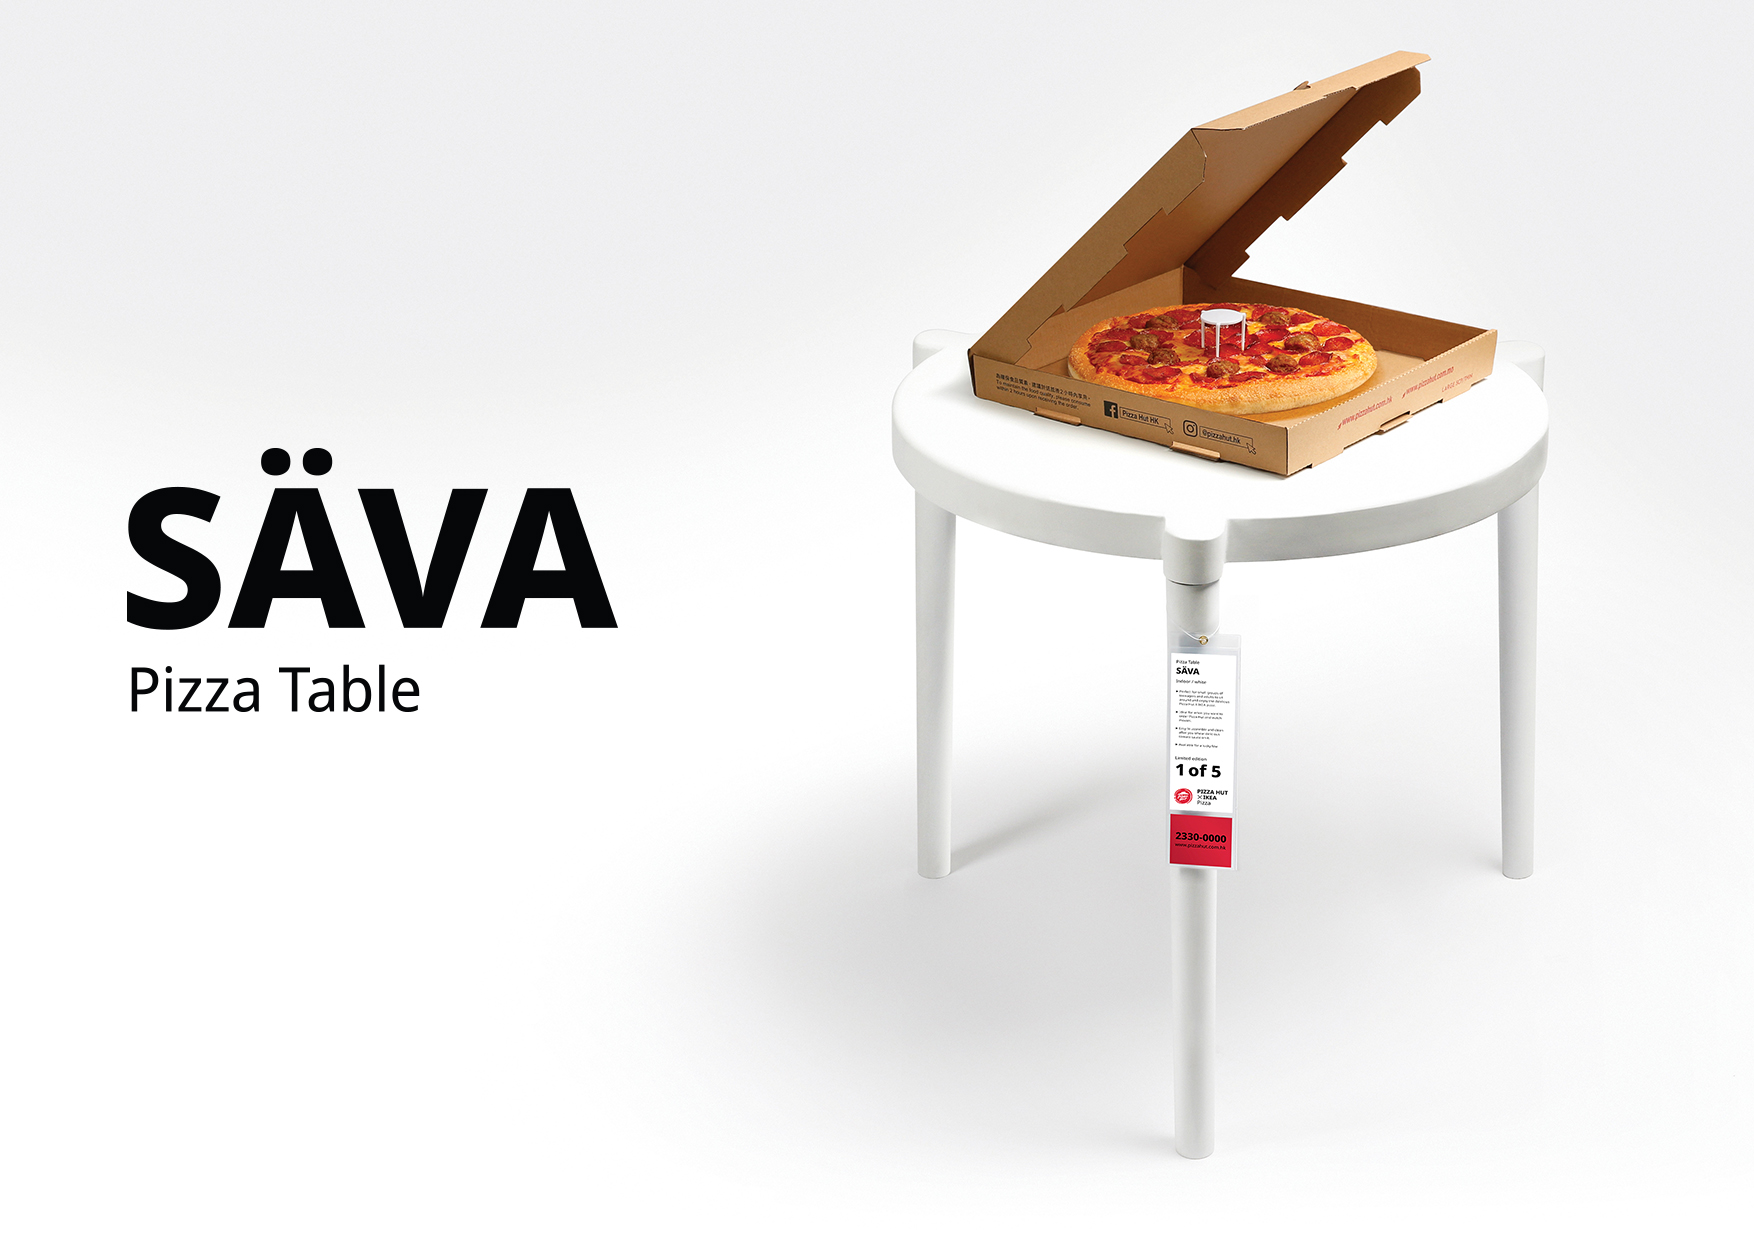 IKEA and Pizza Hut Hong Kong Collab on Swedish Meatball Pizza